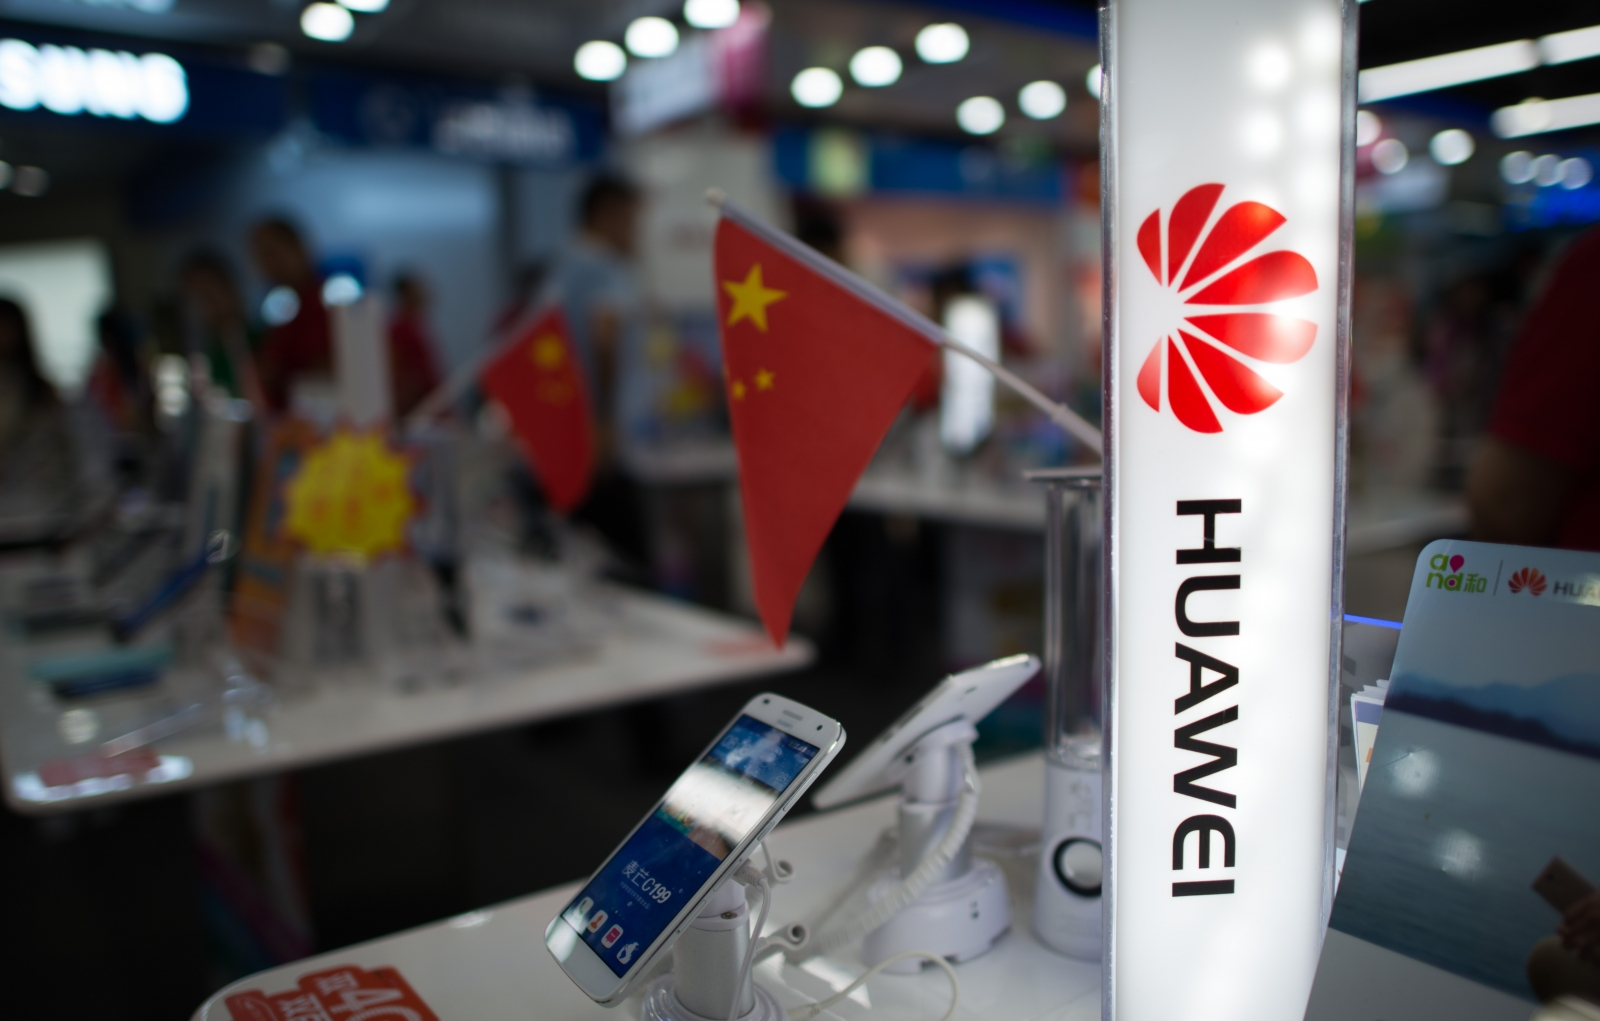 Huawei smartphone sales ban in UK